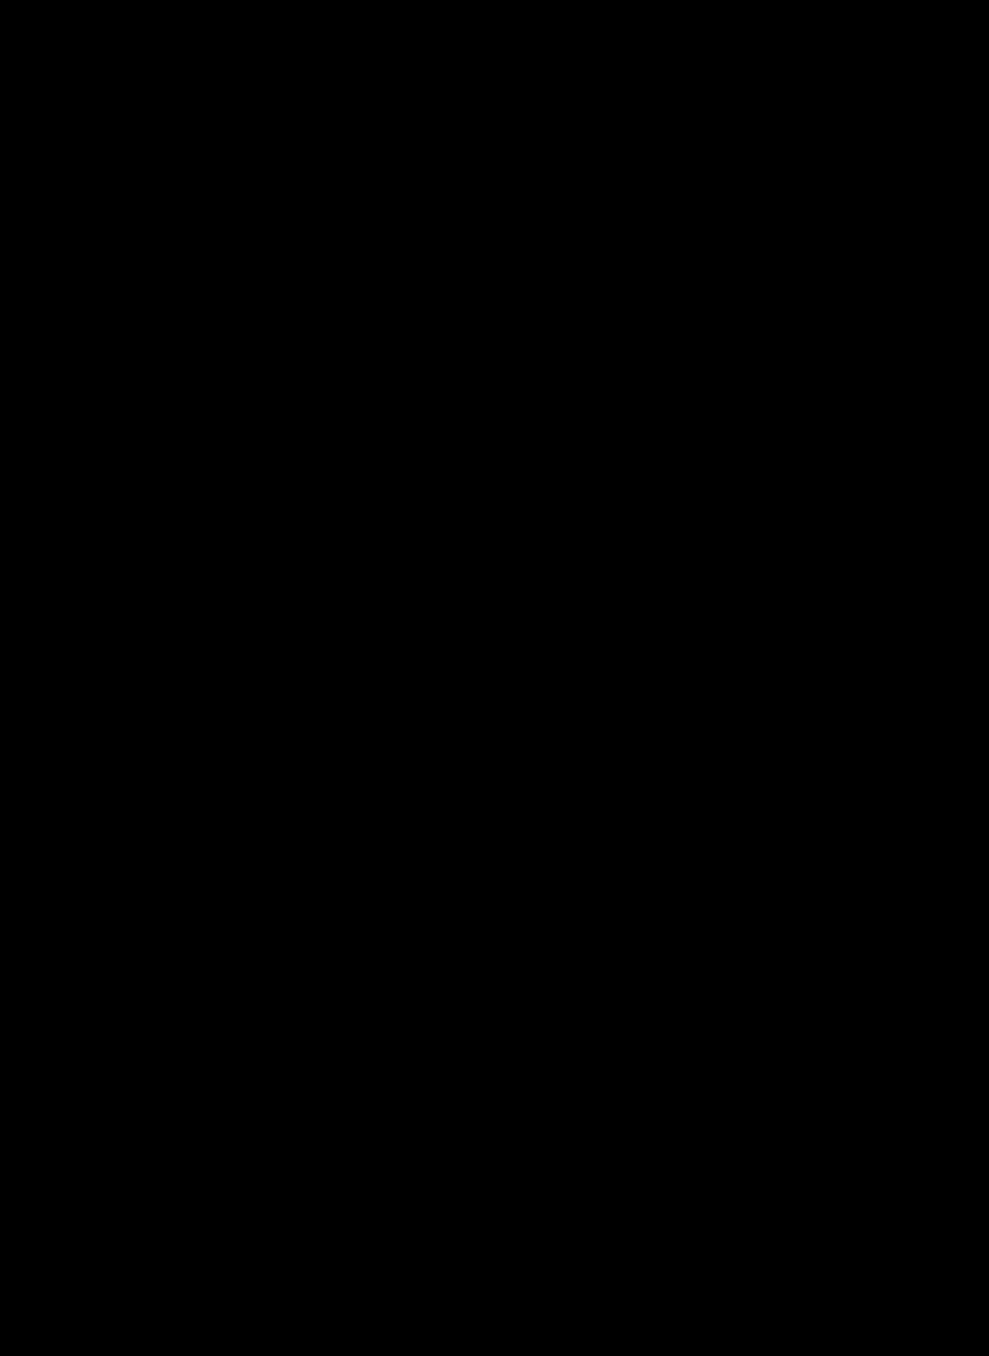 989x1356 Clipart